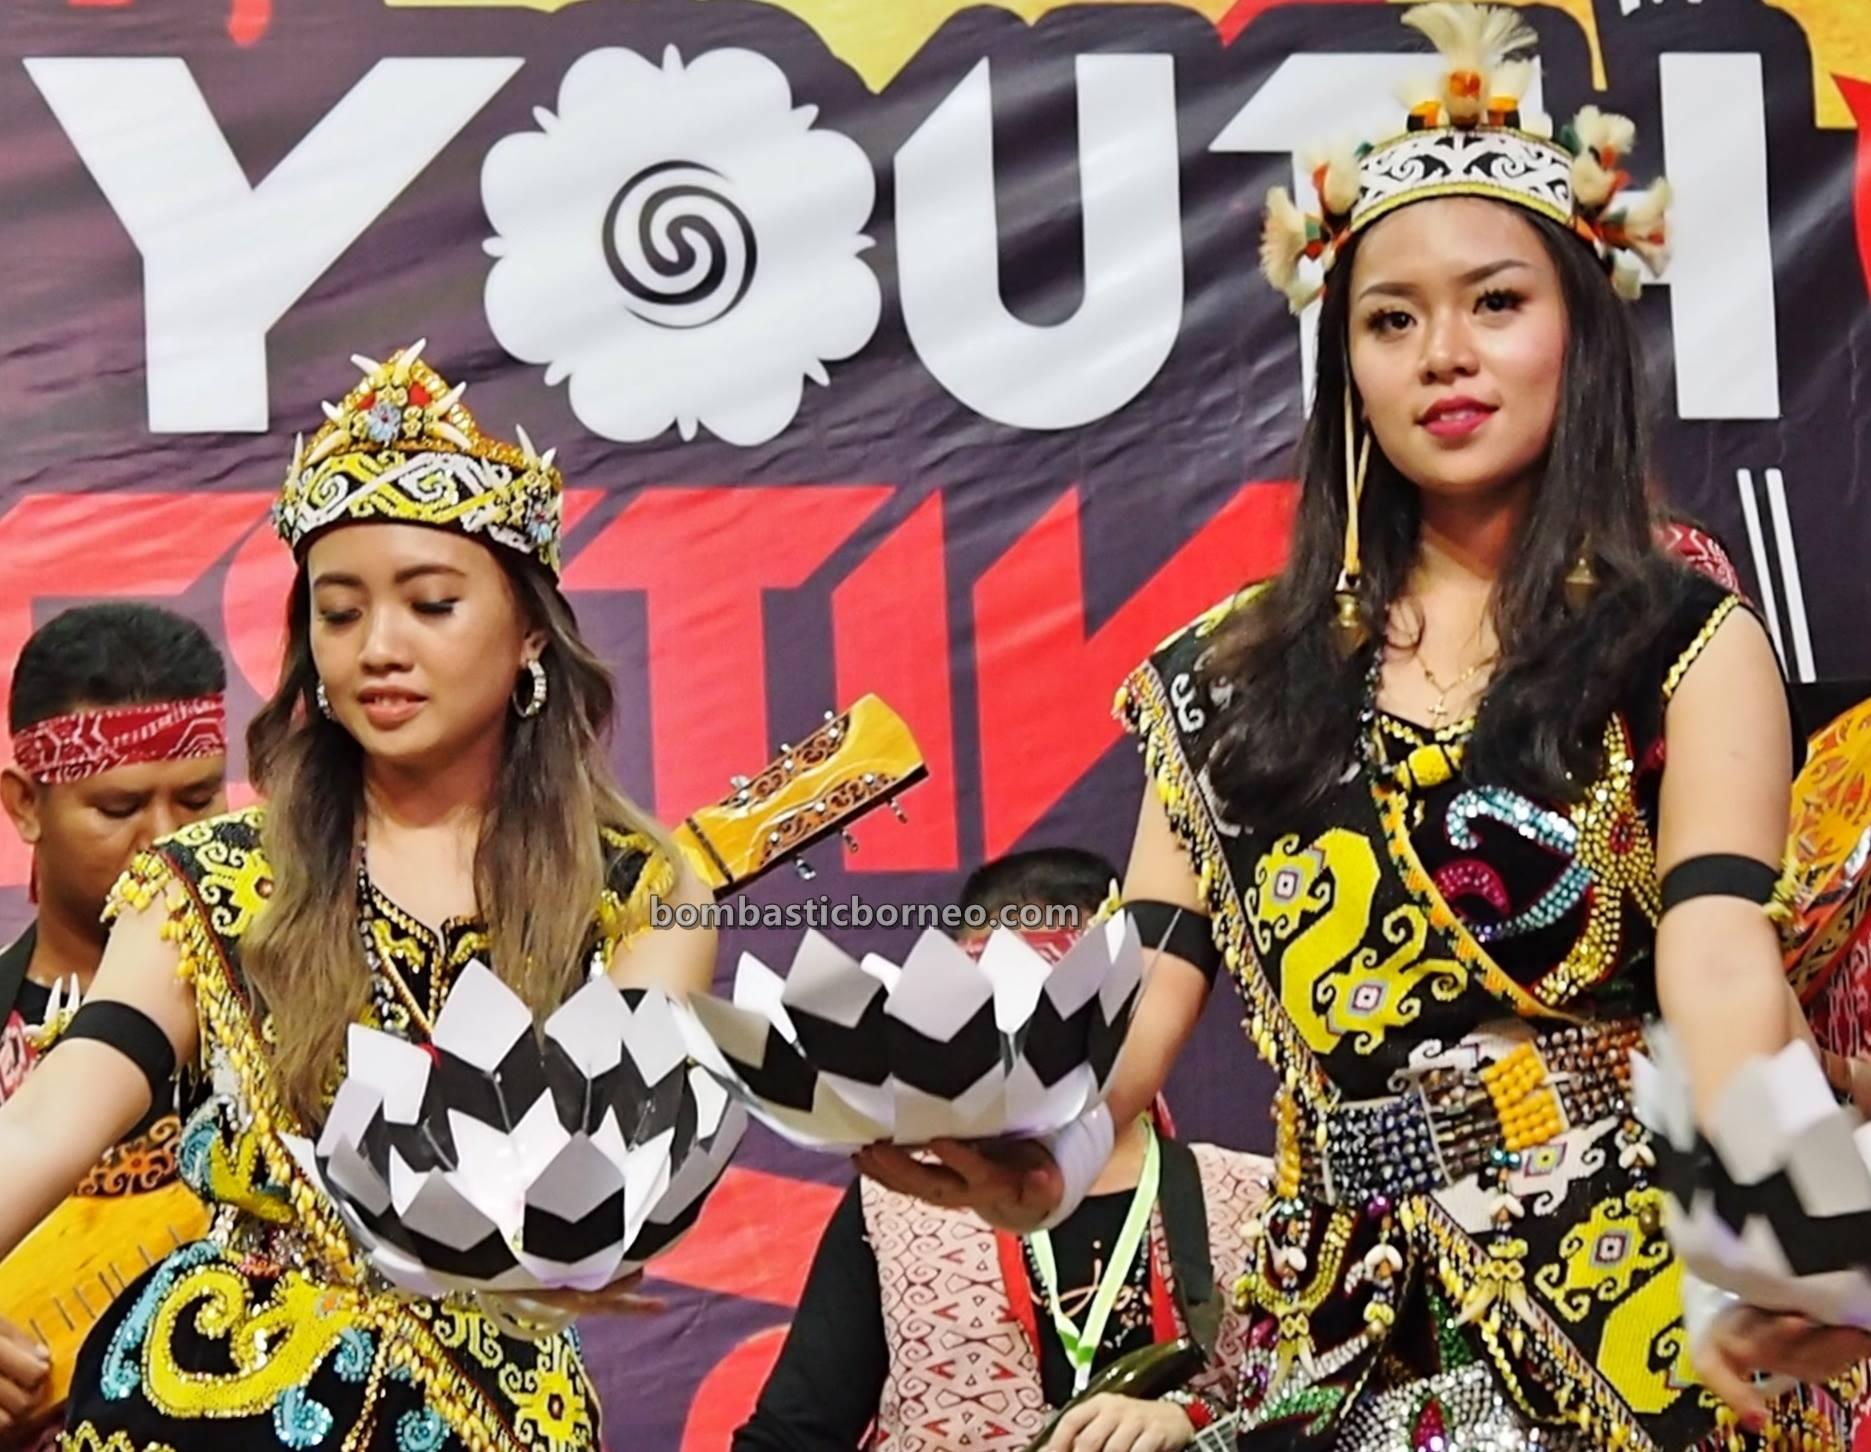 authentic, traditional, Ethnic, tribal, tribe, indigenous, orang ulu, Sibu, One Malaysia Cultural Village, Tourism, Dayak Kenyah, travel guide, cross border, 婆罗洲原住民文化, 砂拉越达雅肯雅族